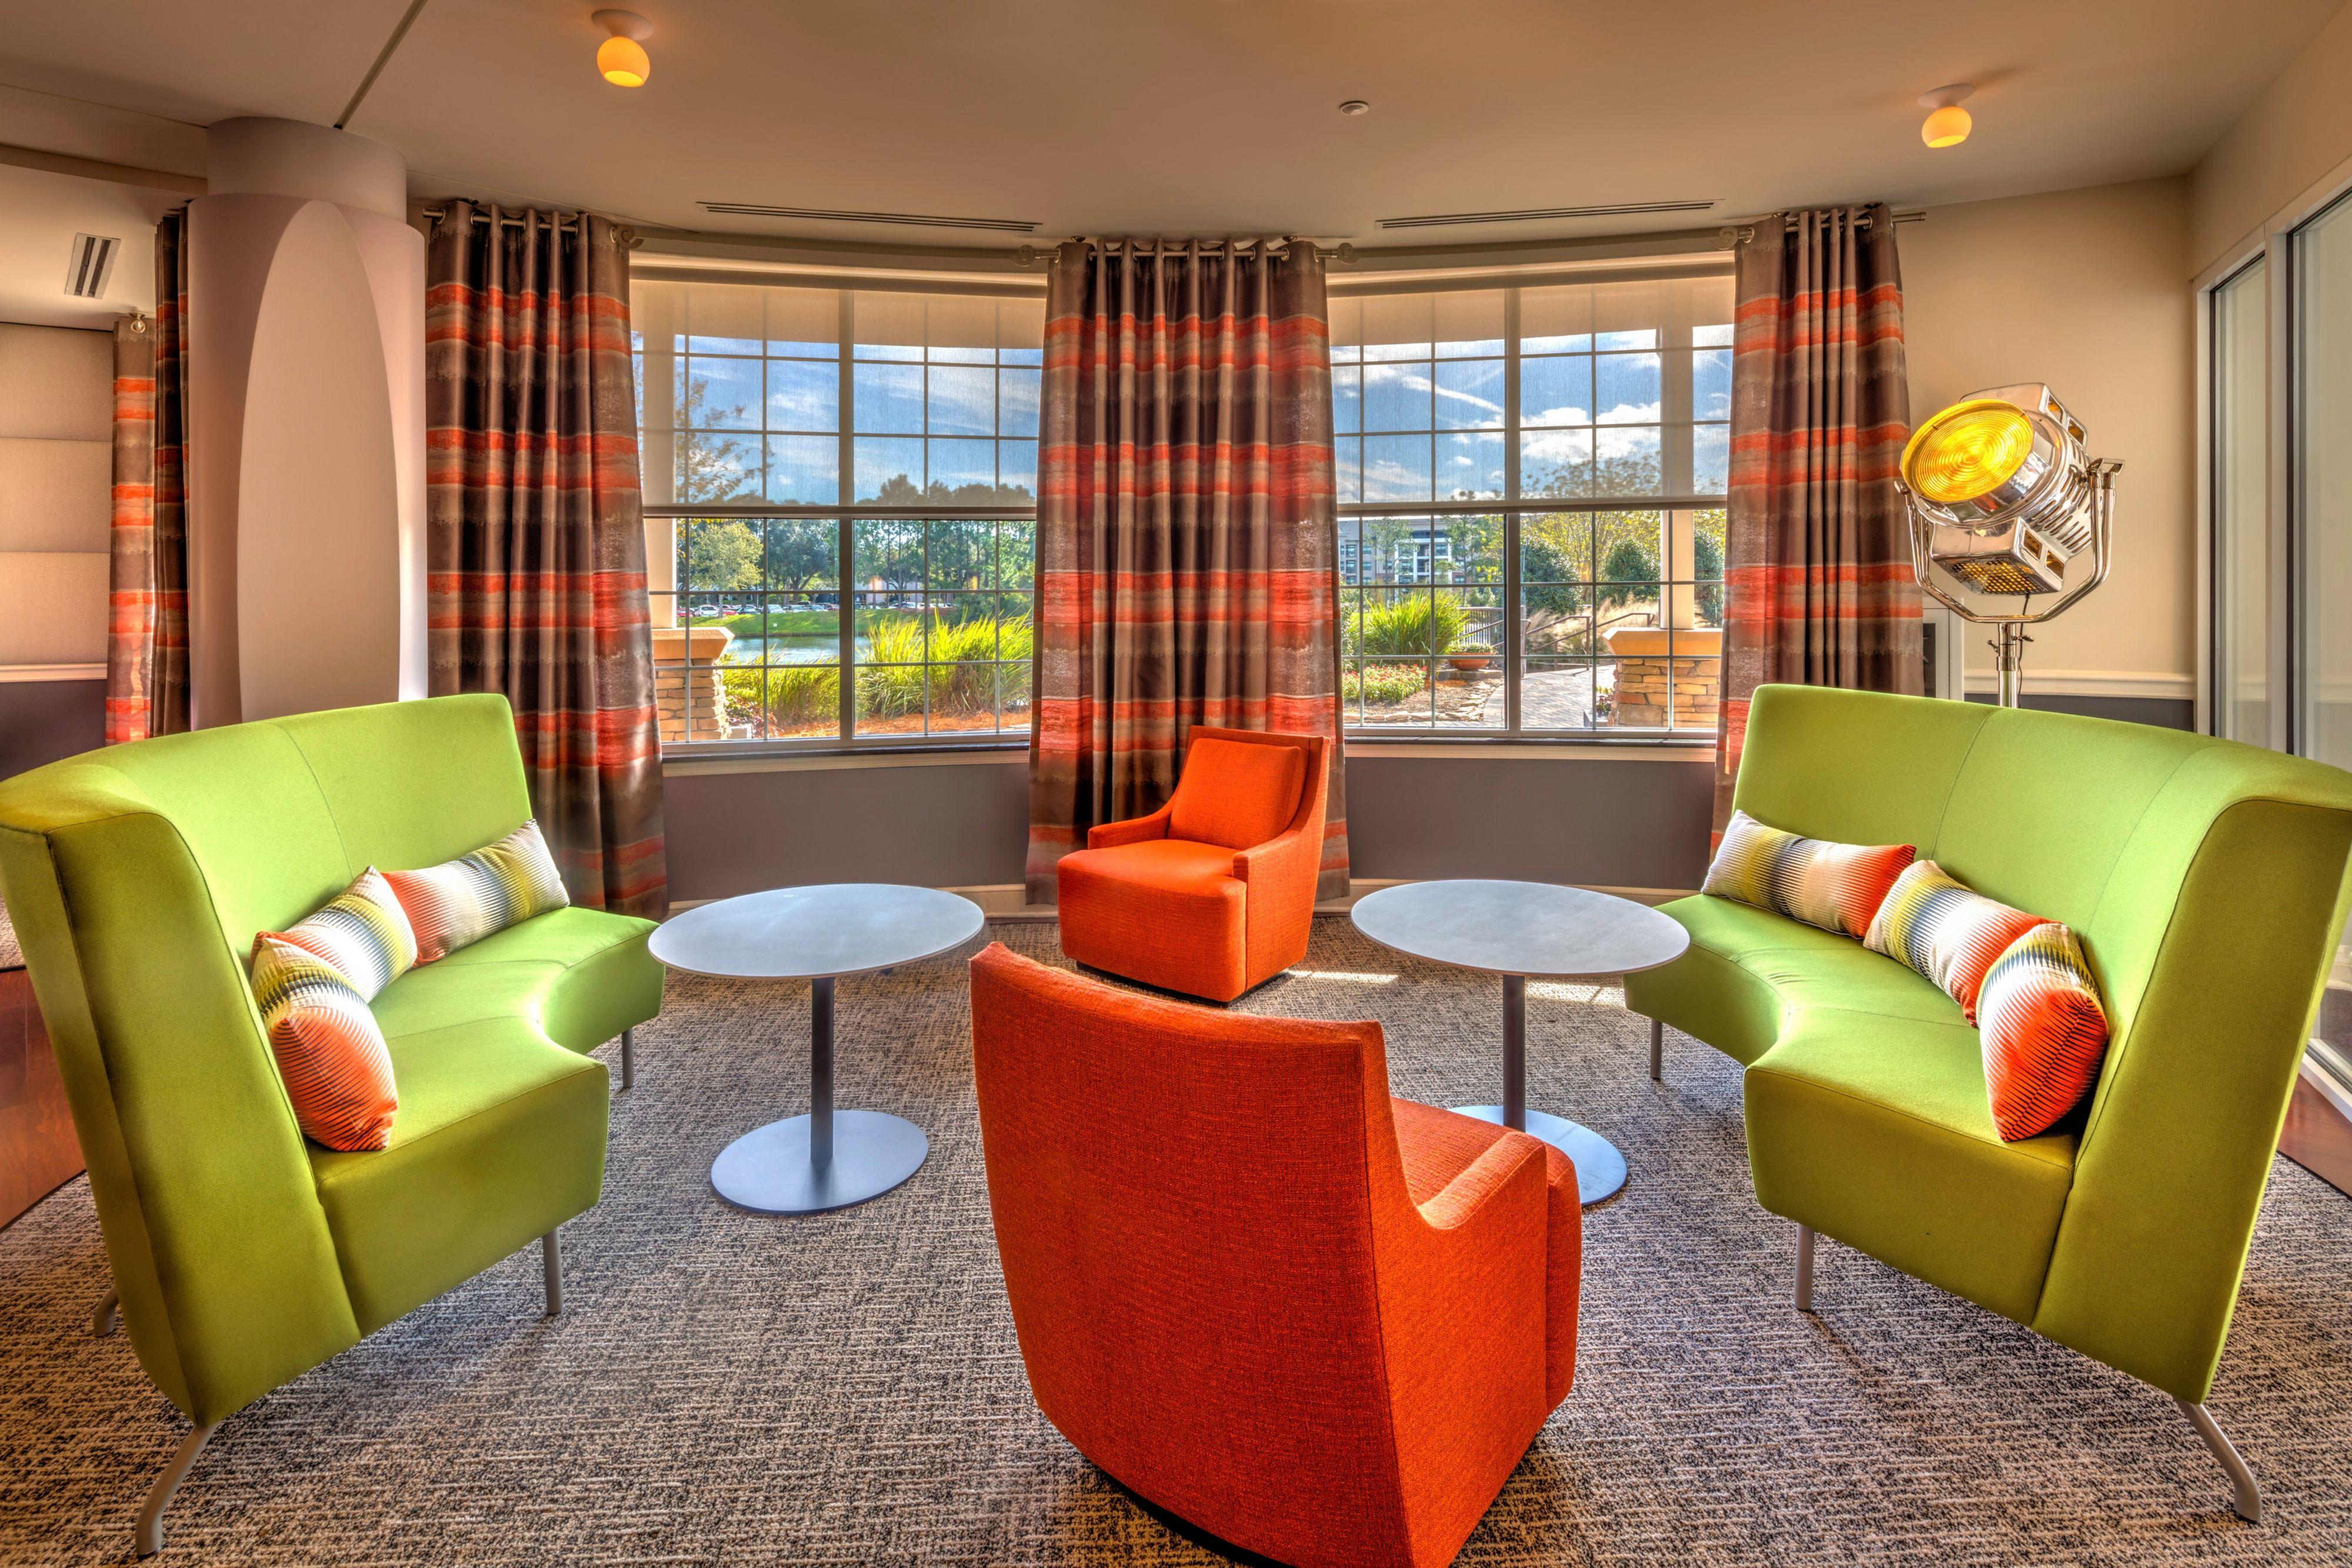 Hotel Indigo Jacksonville-Deerwood Park image 4